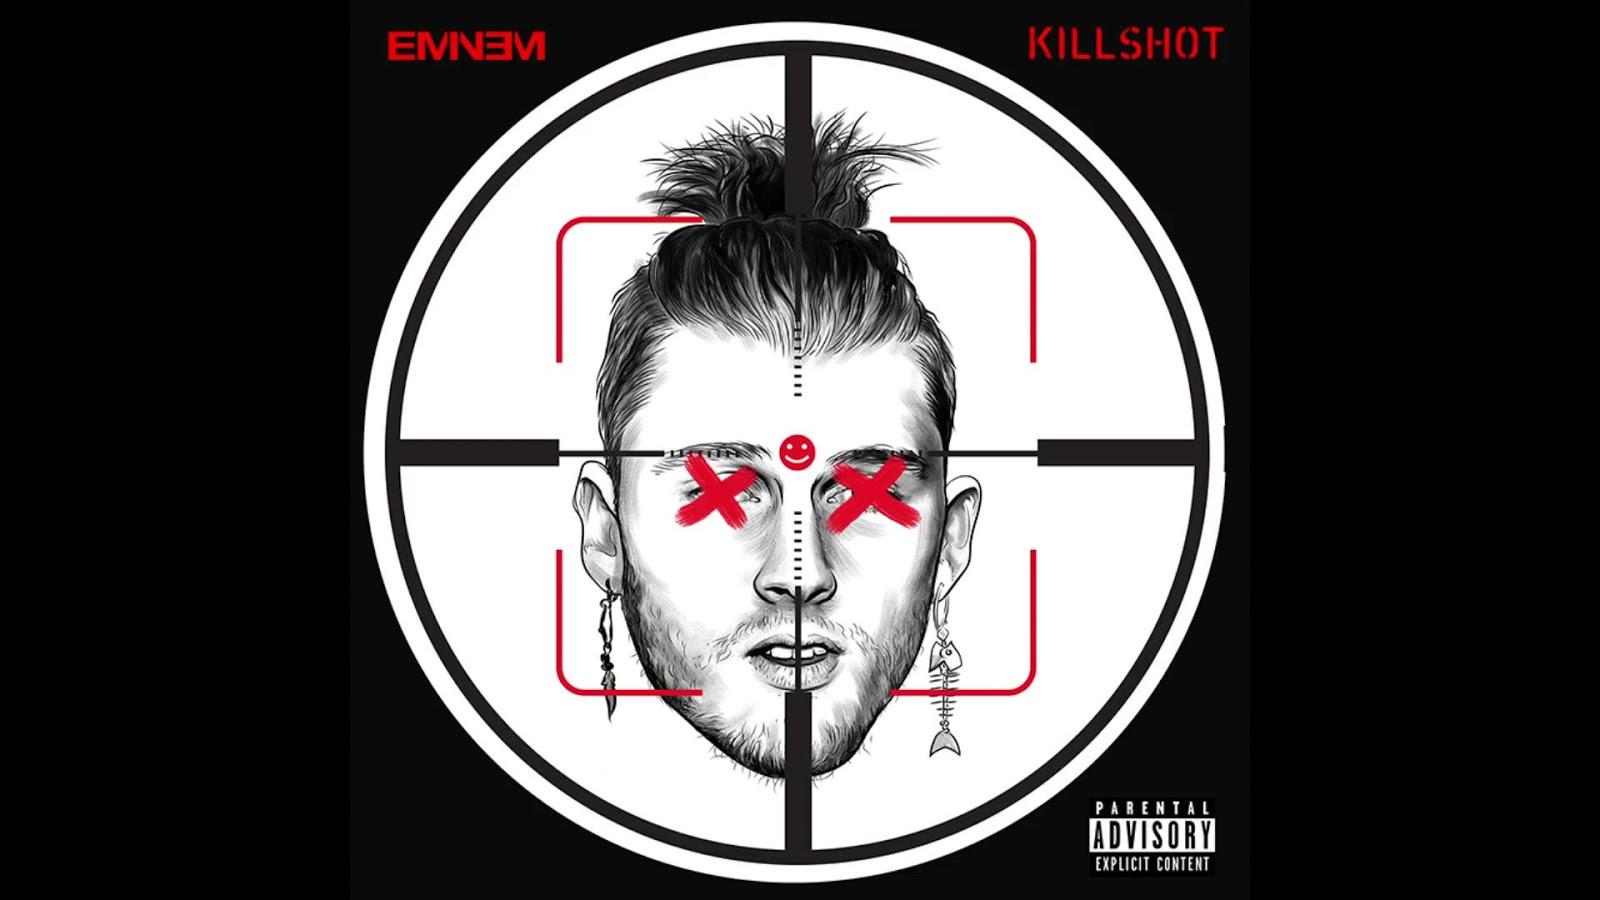 DOWNLOAD MUSIC: Eminem – KillShot Mp3 (MGK Diss)